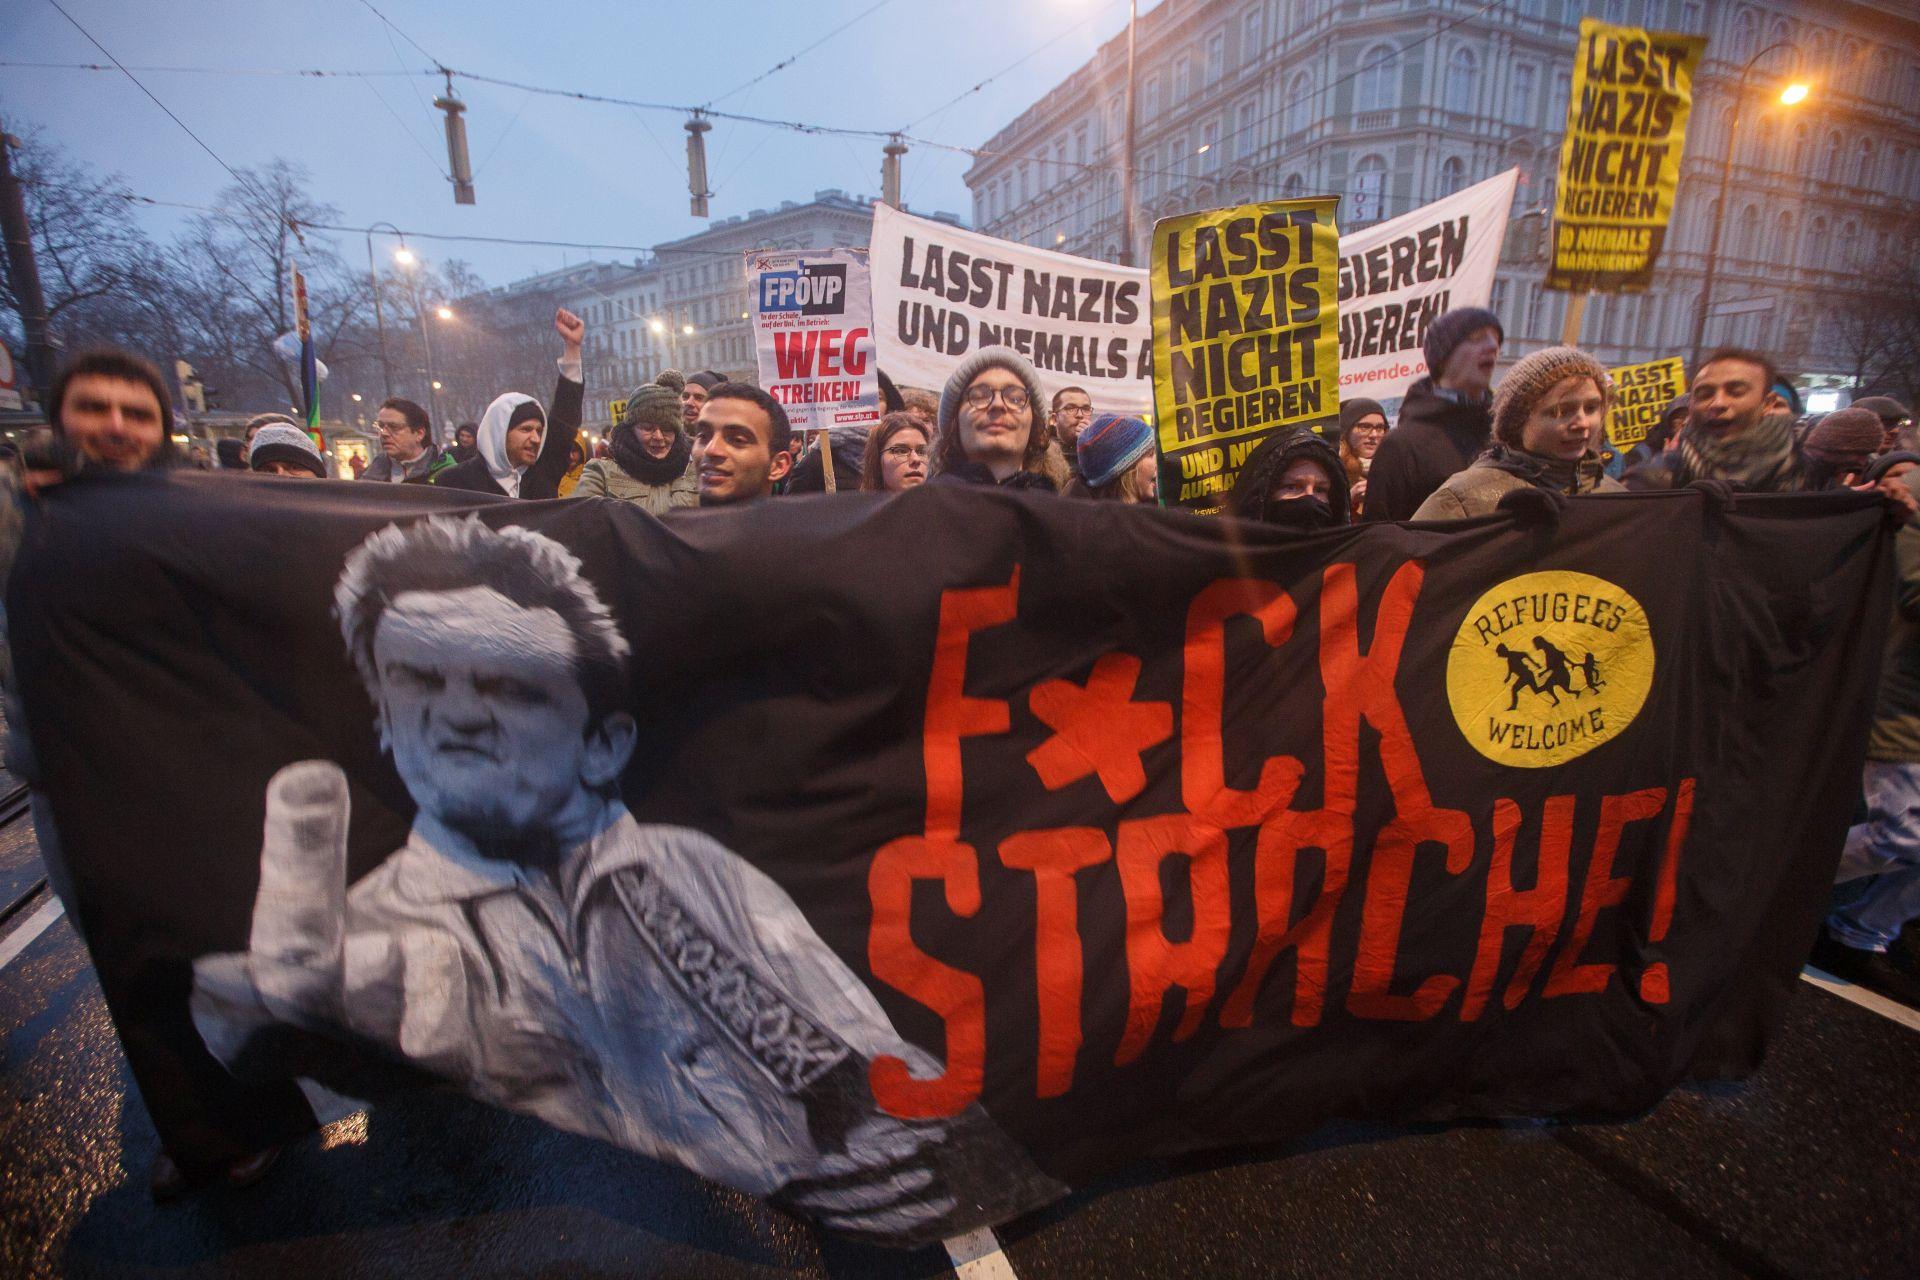 Austrijska ljevica prosvjeduje protiv desne vlasti